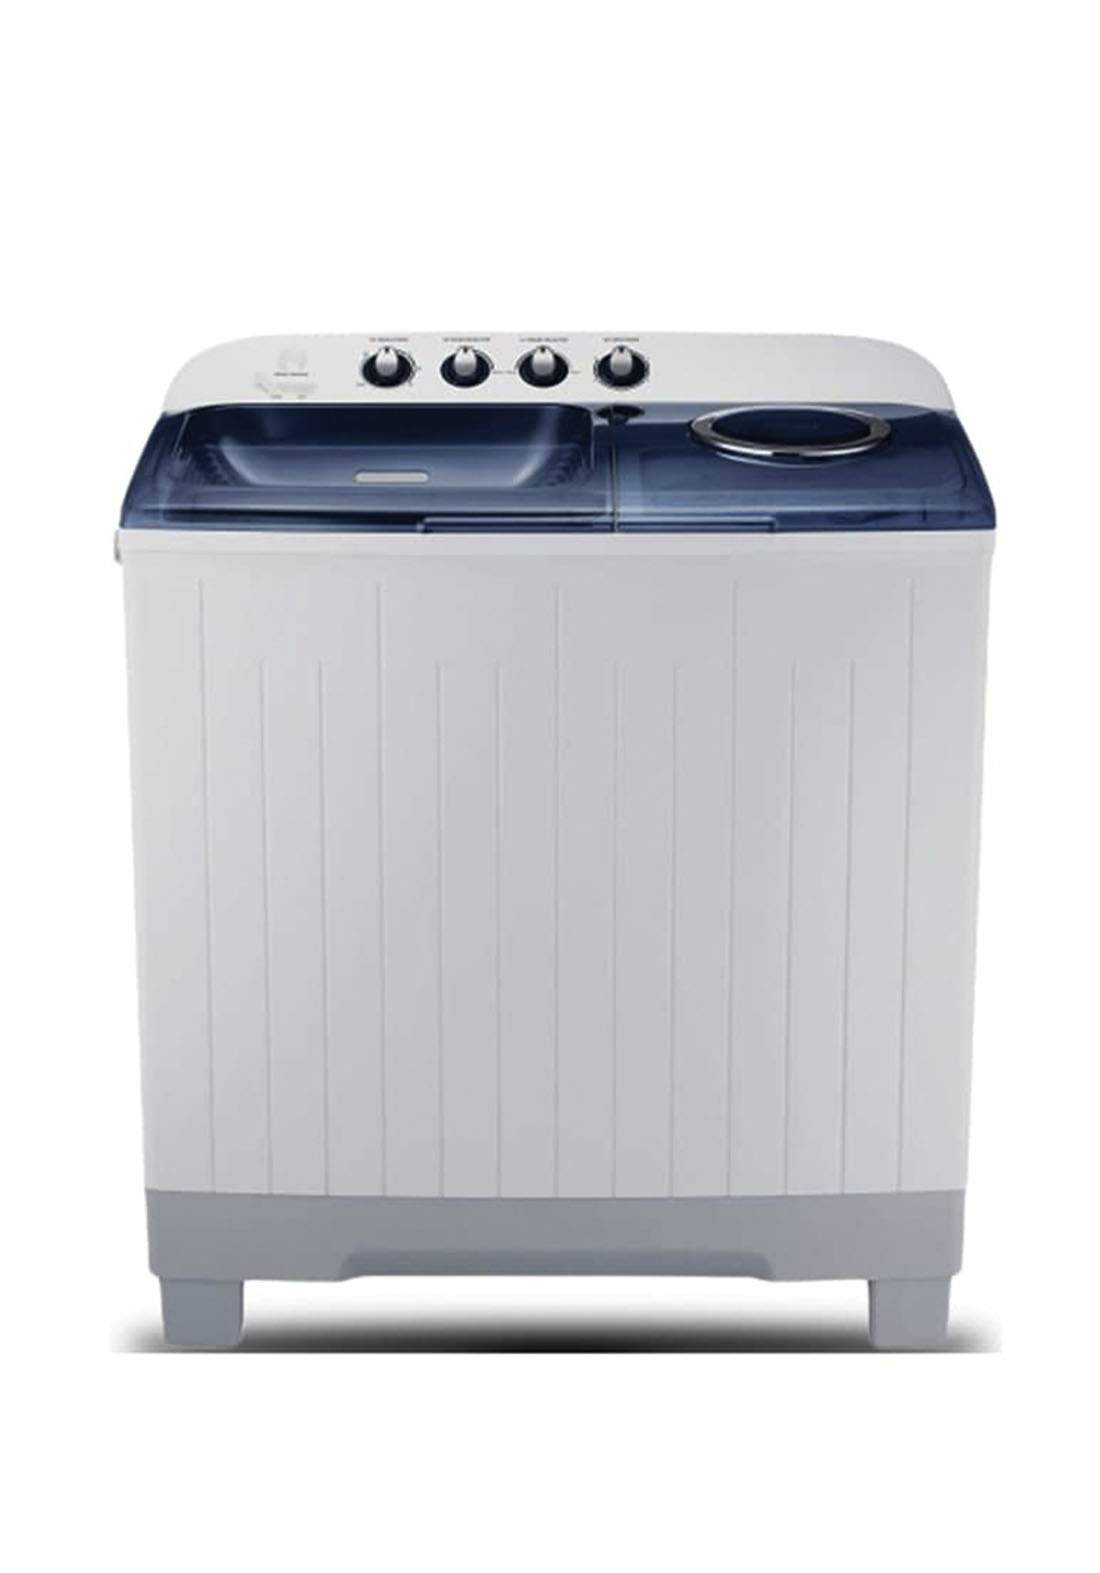 Shark Twin tub washing machine 9 kg غسالة شارك 9 كيلو